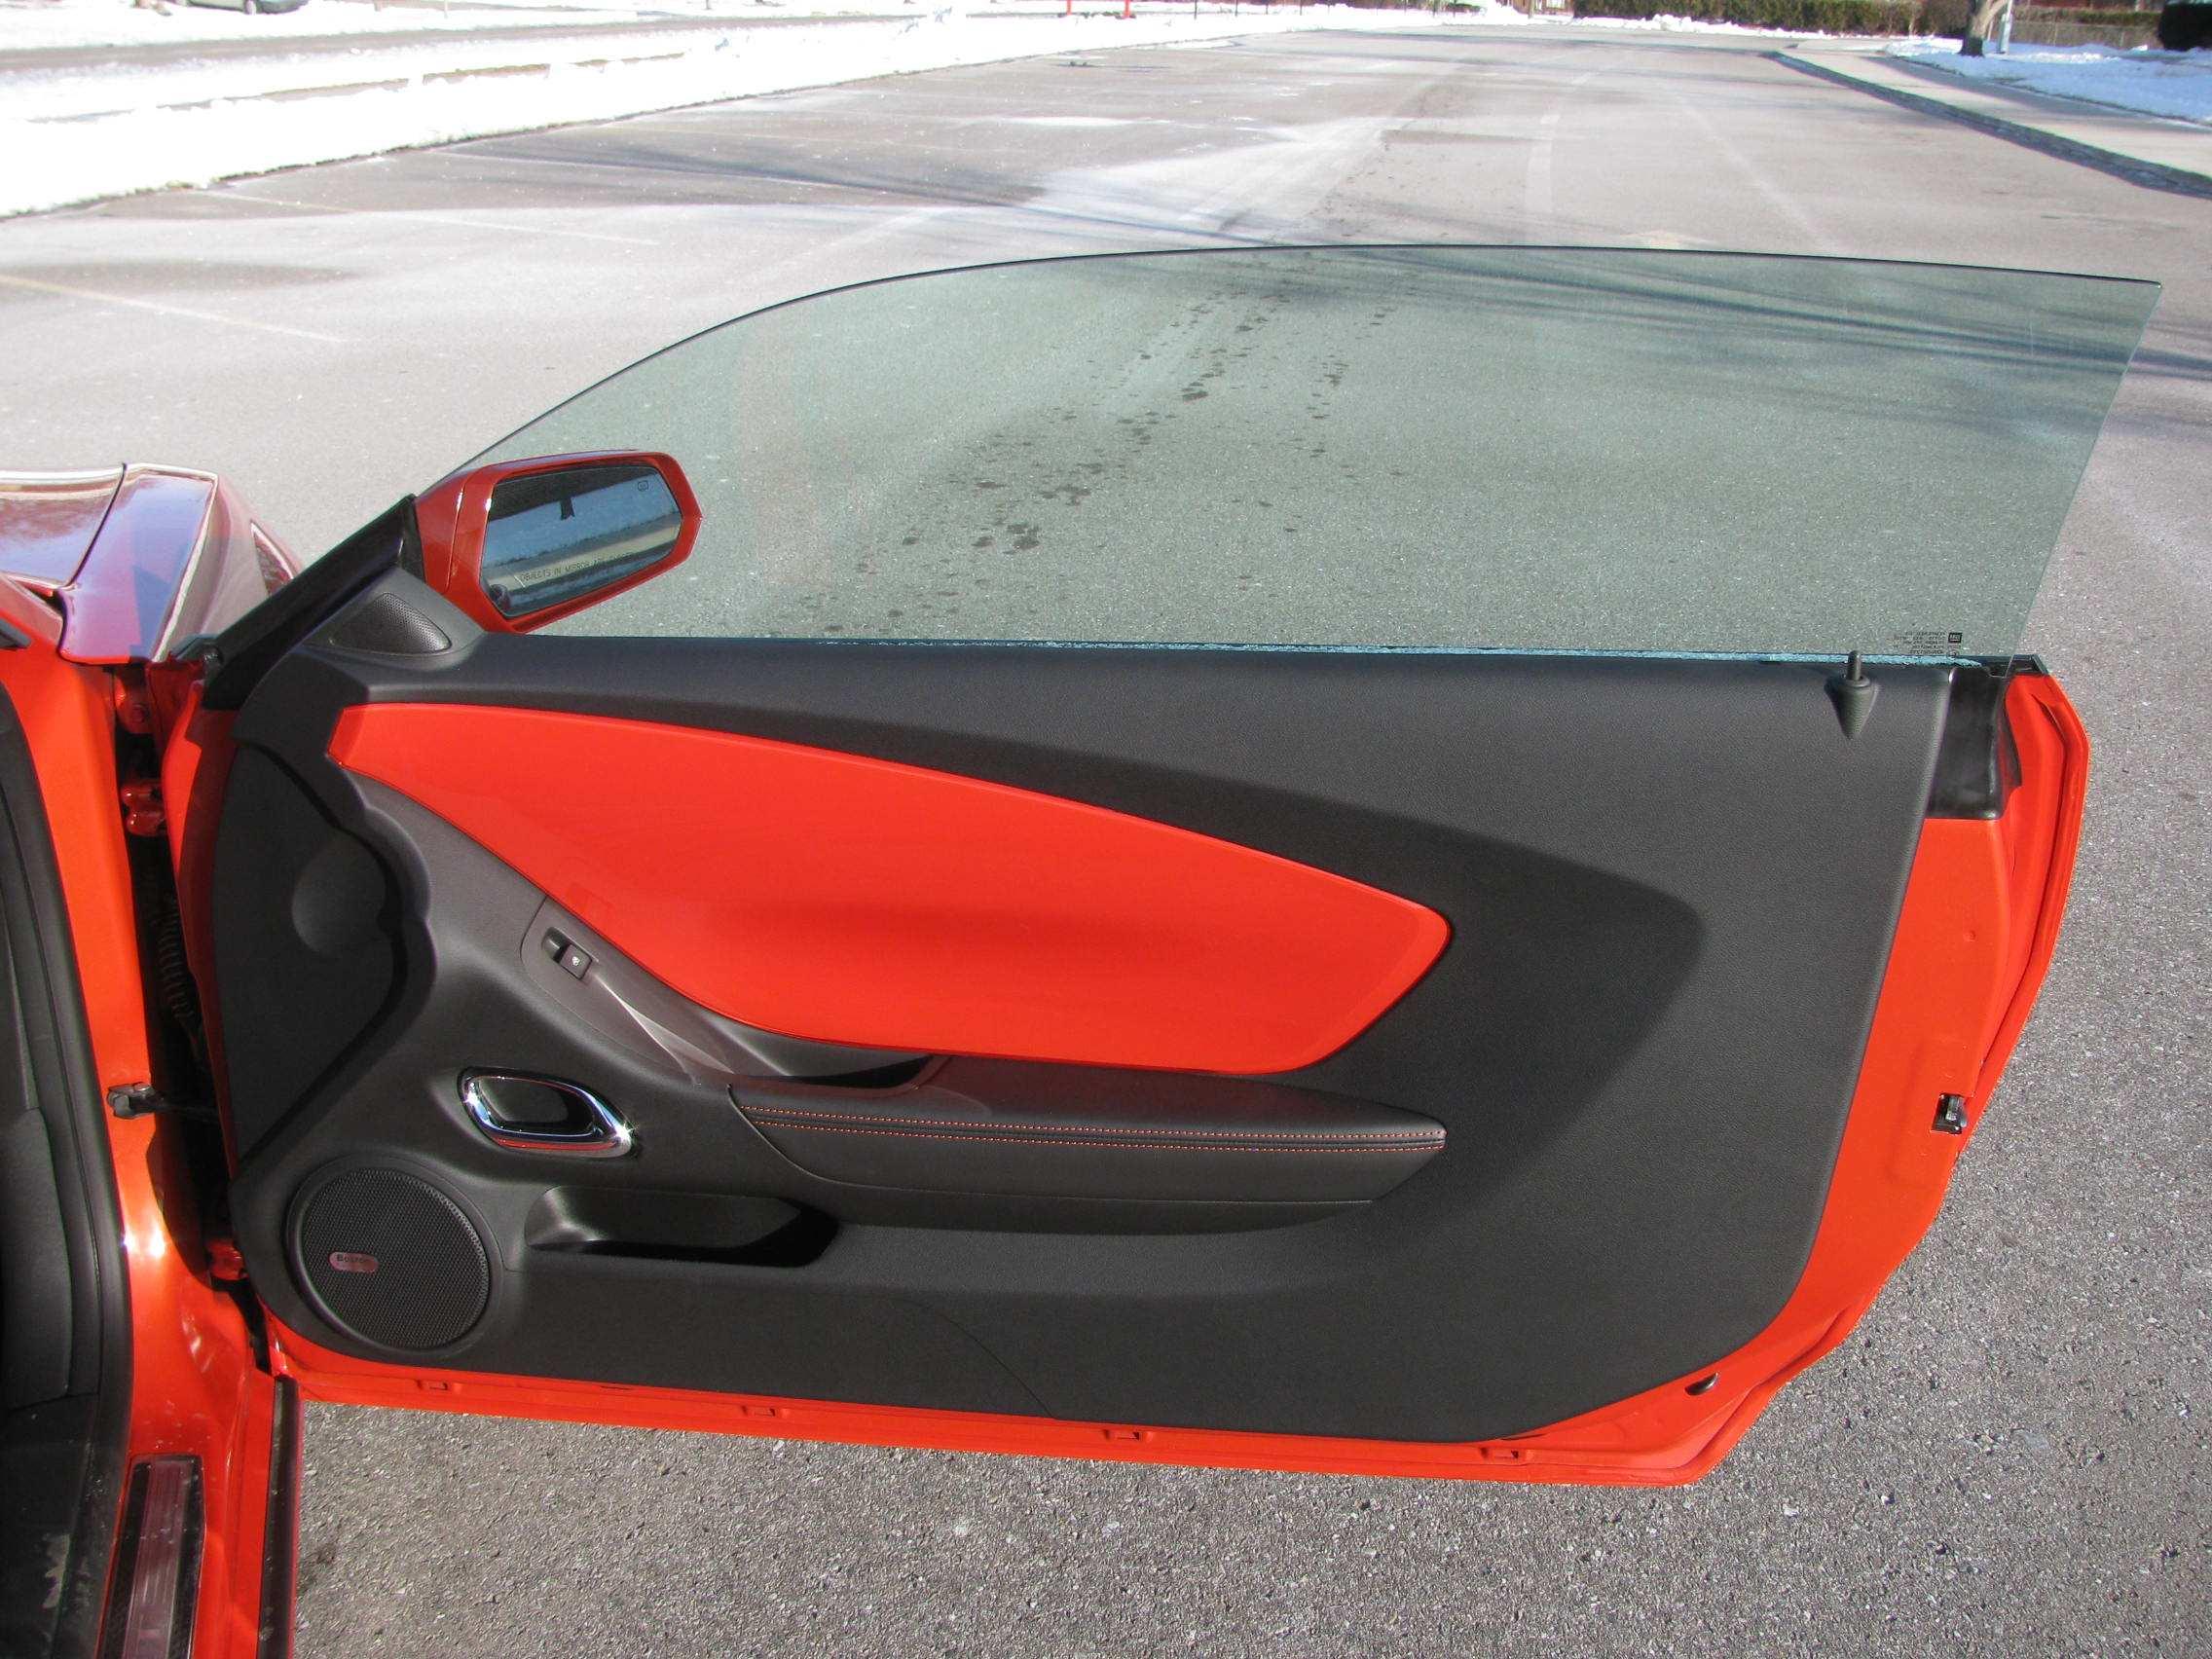 camaro door & camaro door - Autosavant   Autosavant